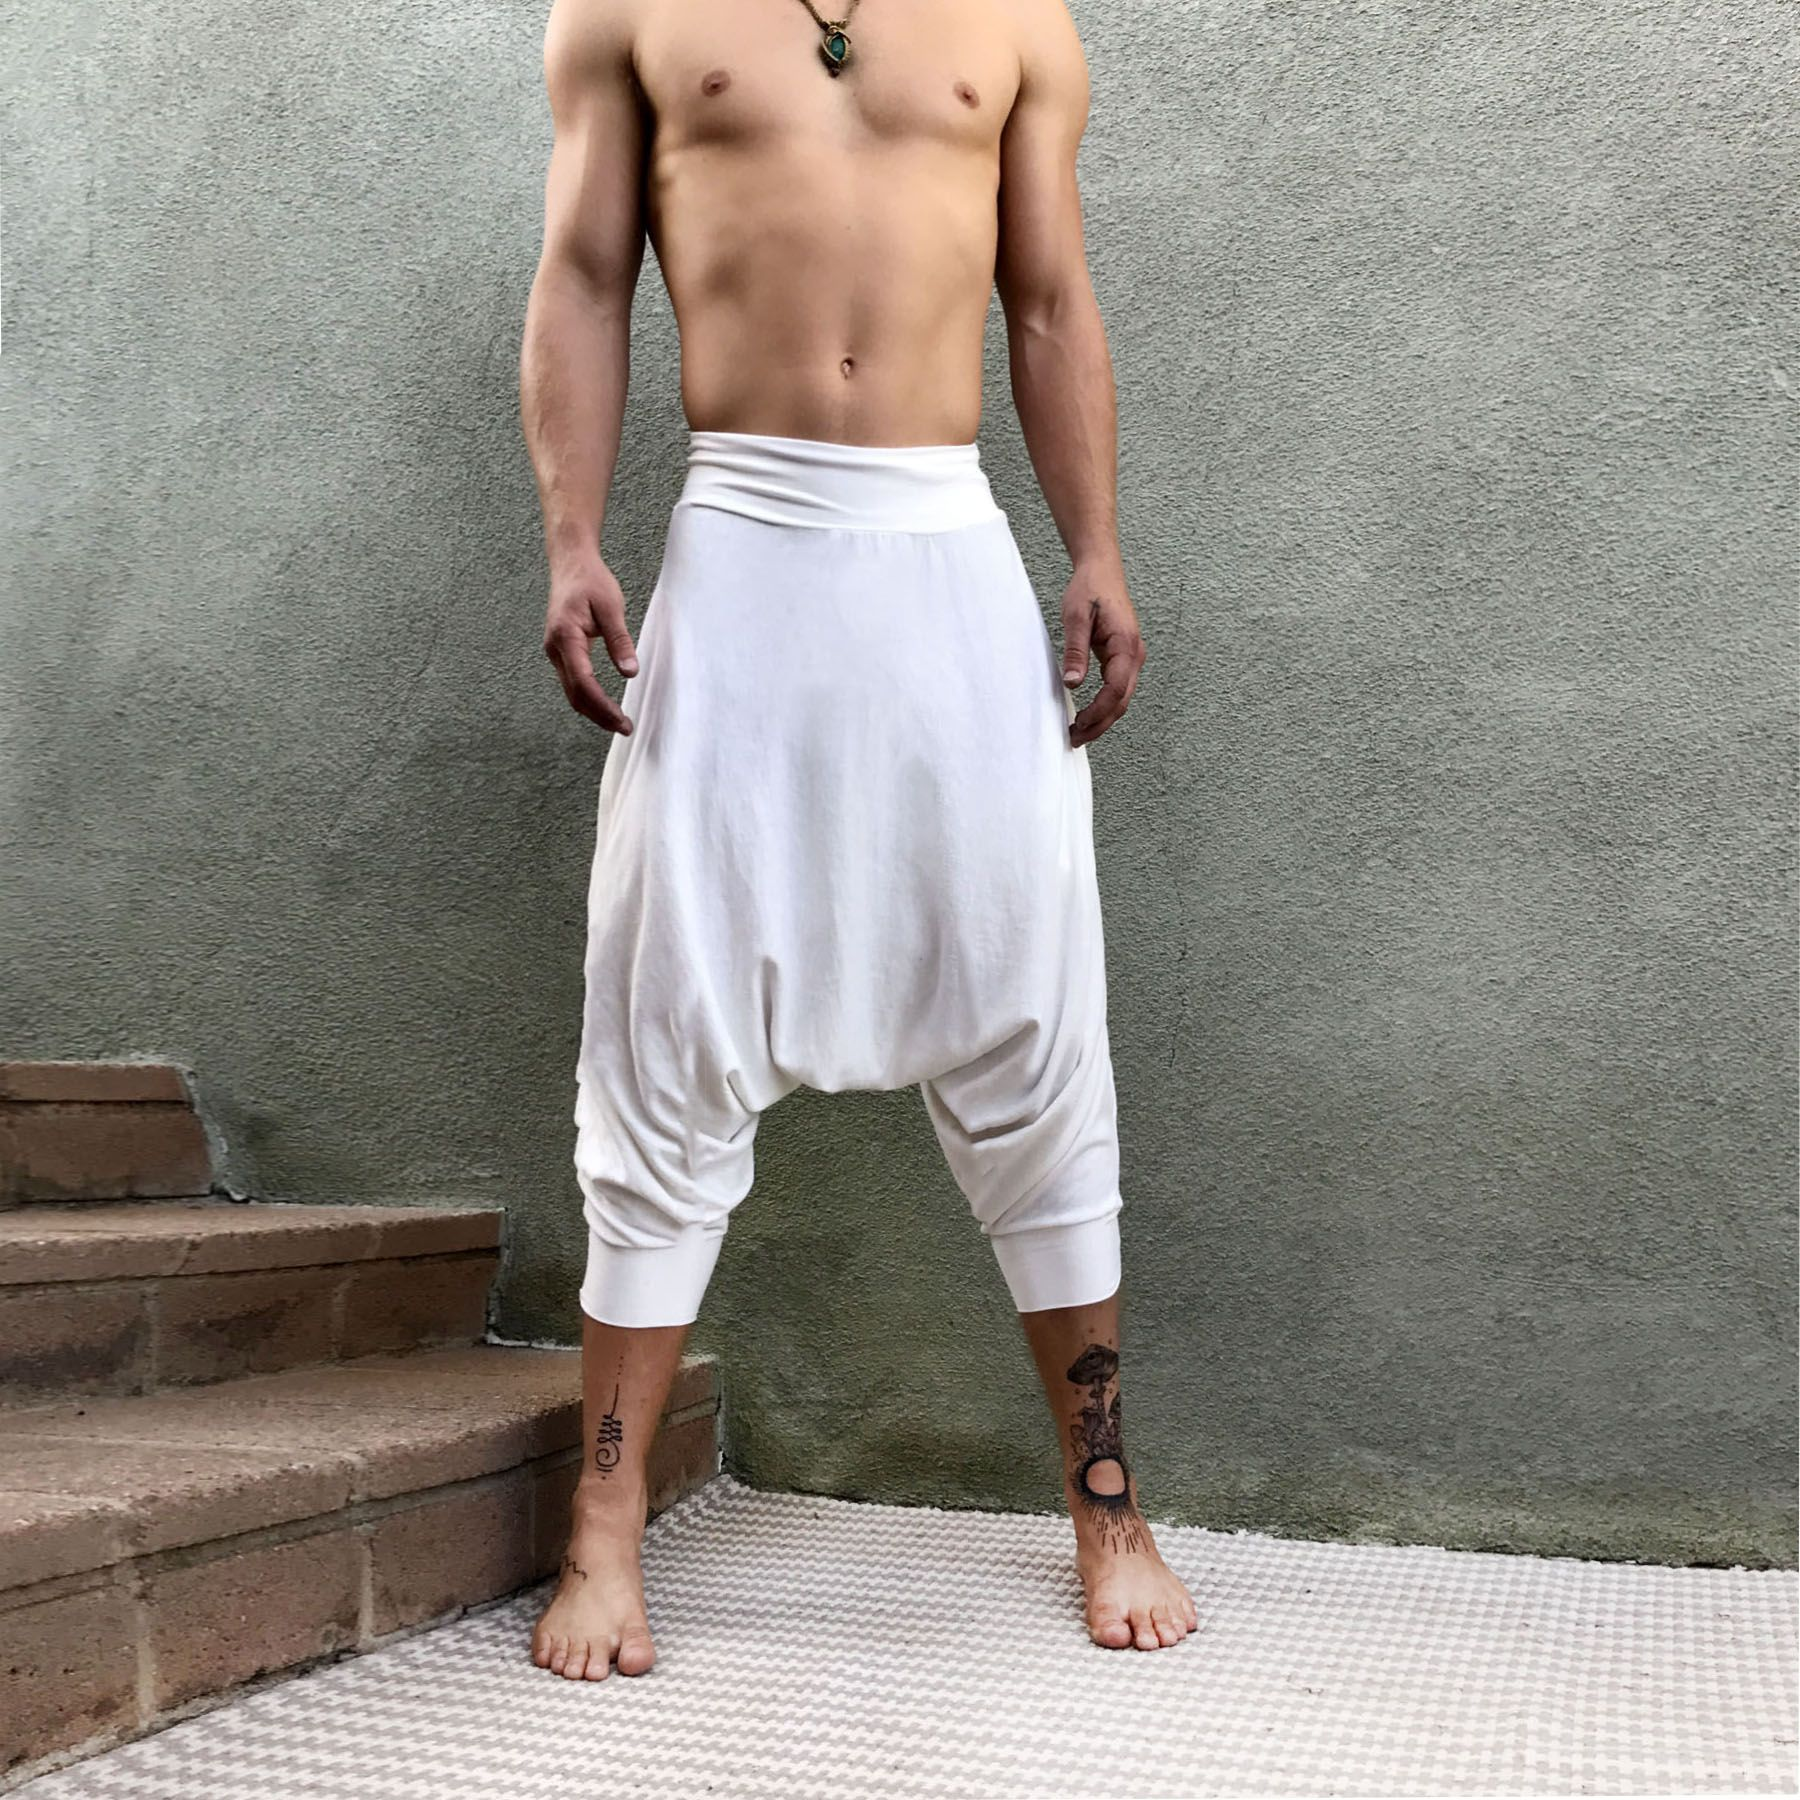 Samurai Pants Ninja Pants Sarouel Femme Sarouel Homme Glorka Harem Pants Women Loose Yoga Pants Burning Man Costume Harem Pants Men